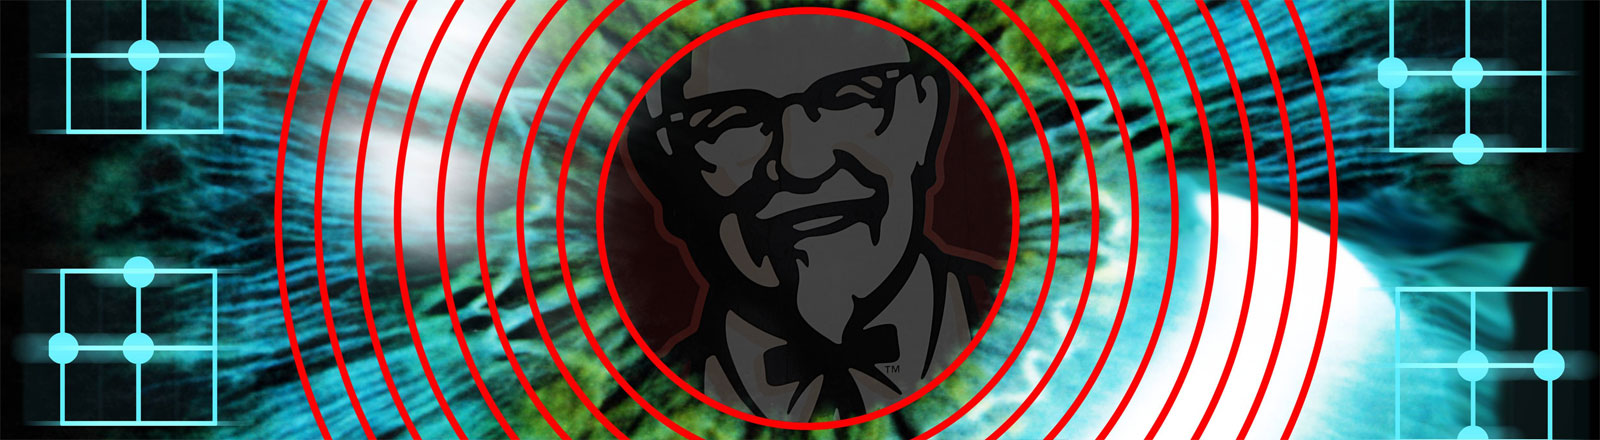 KFC-Logo in Augenscanner